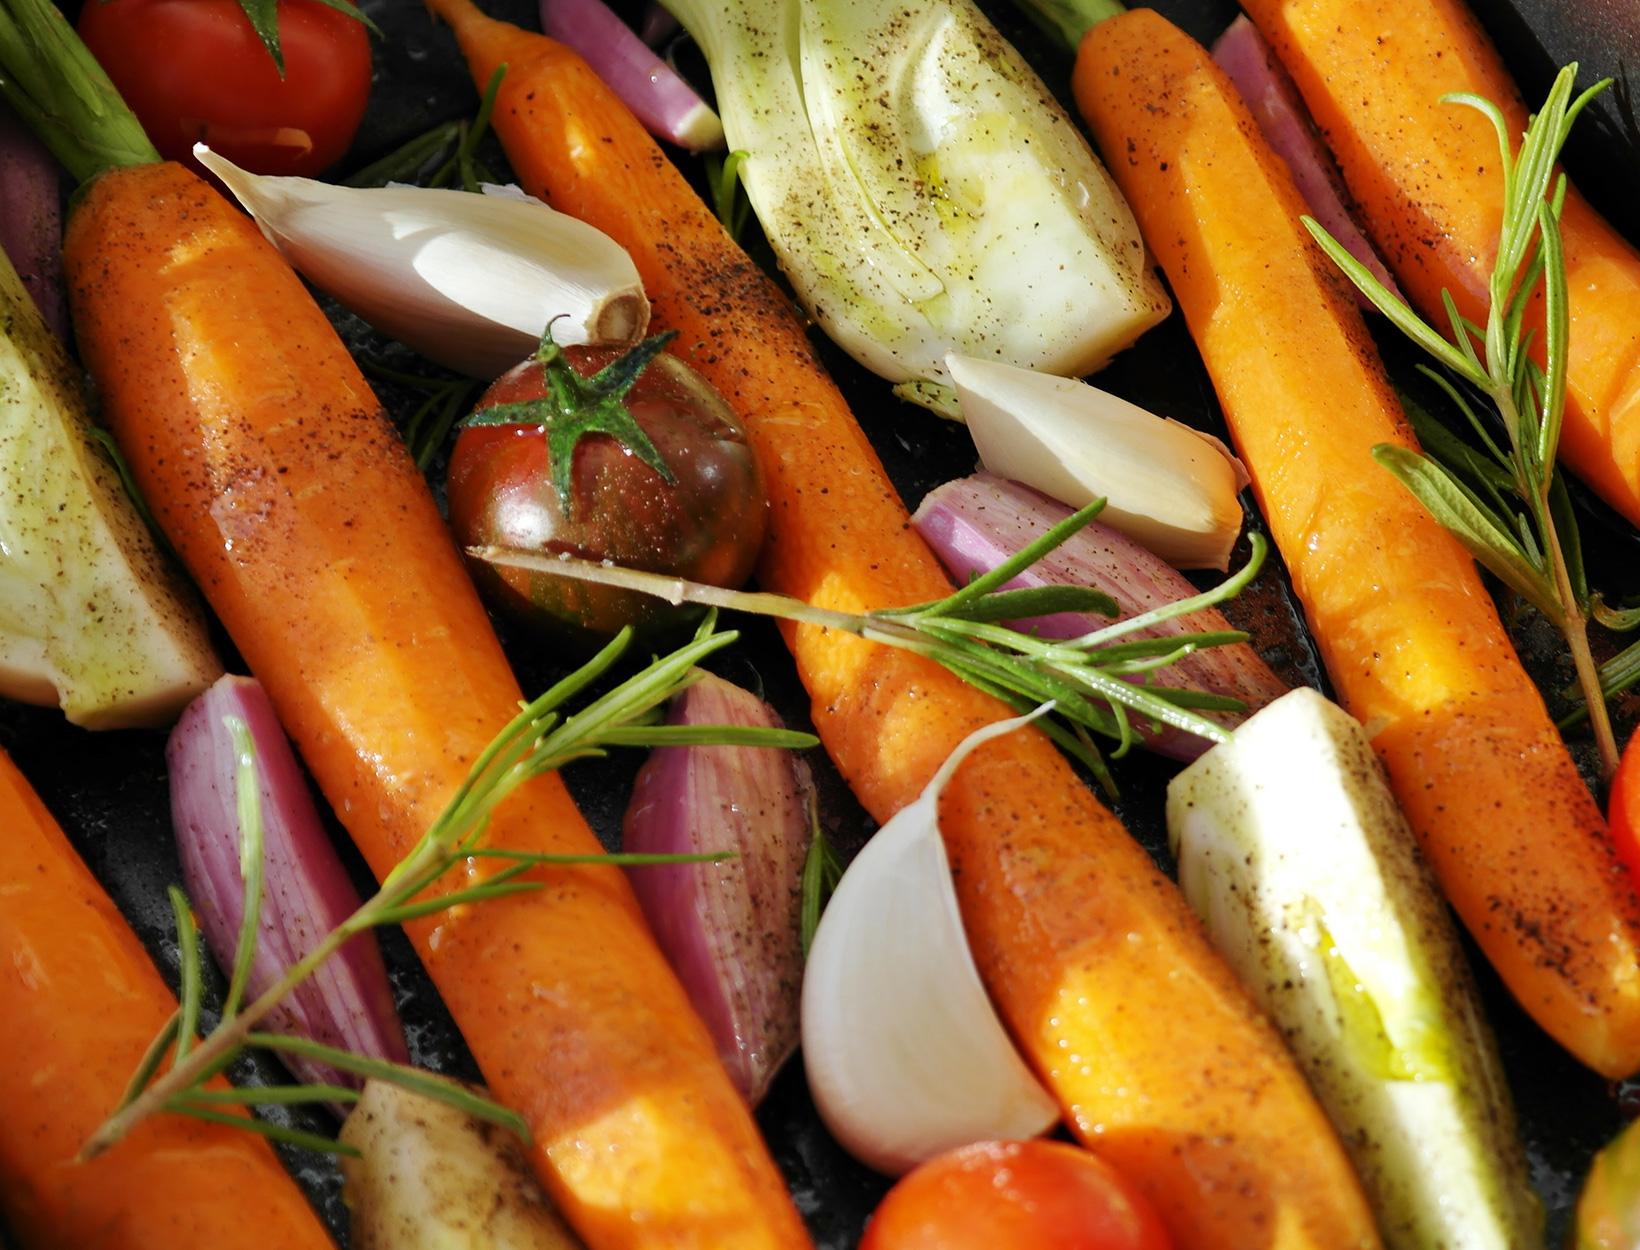 Mediterranean Diet May Protect against Alzheimer's Disease